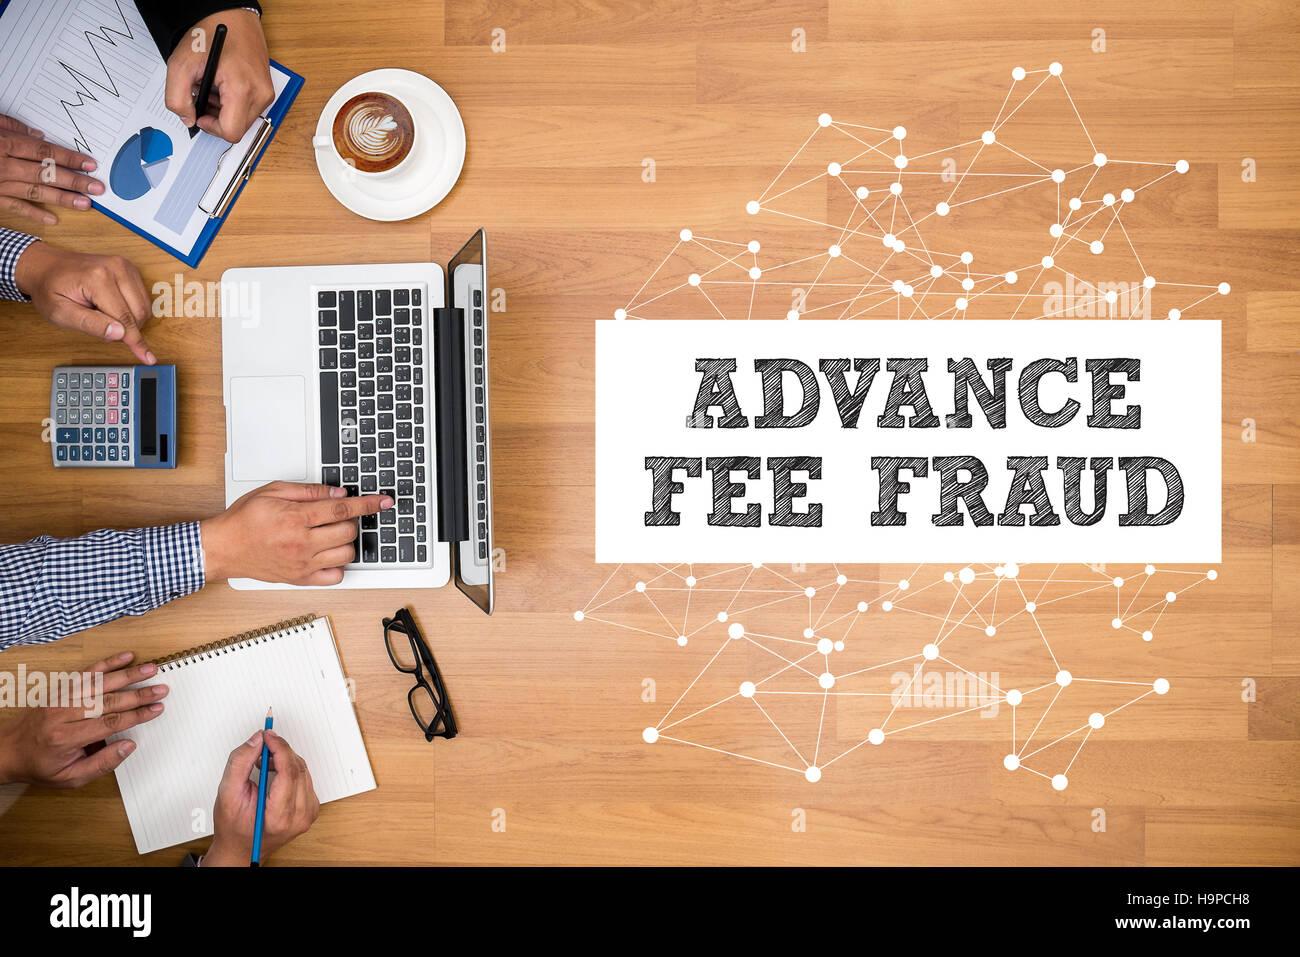 ADVANCE-FEE FRAUD - Stock Image